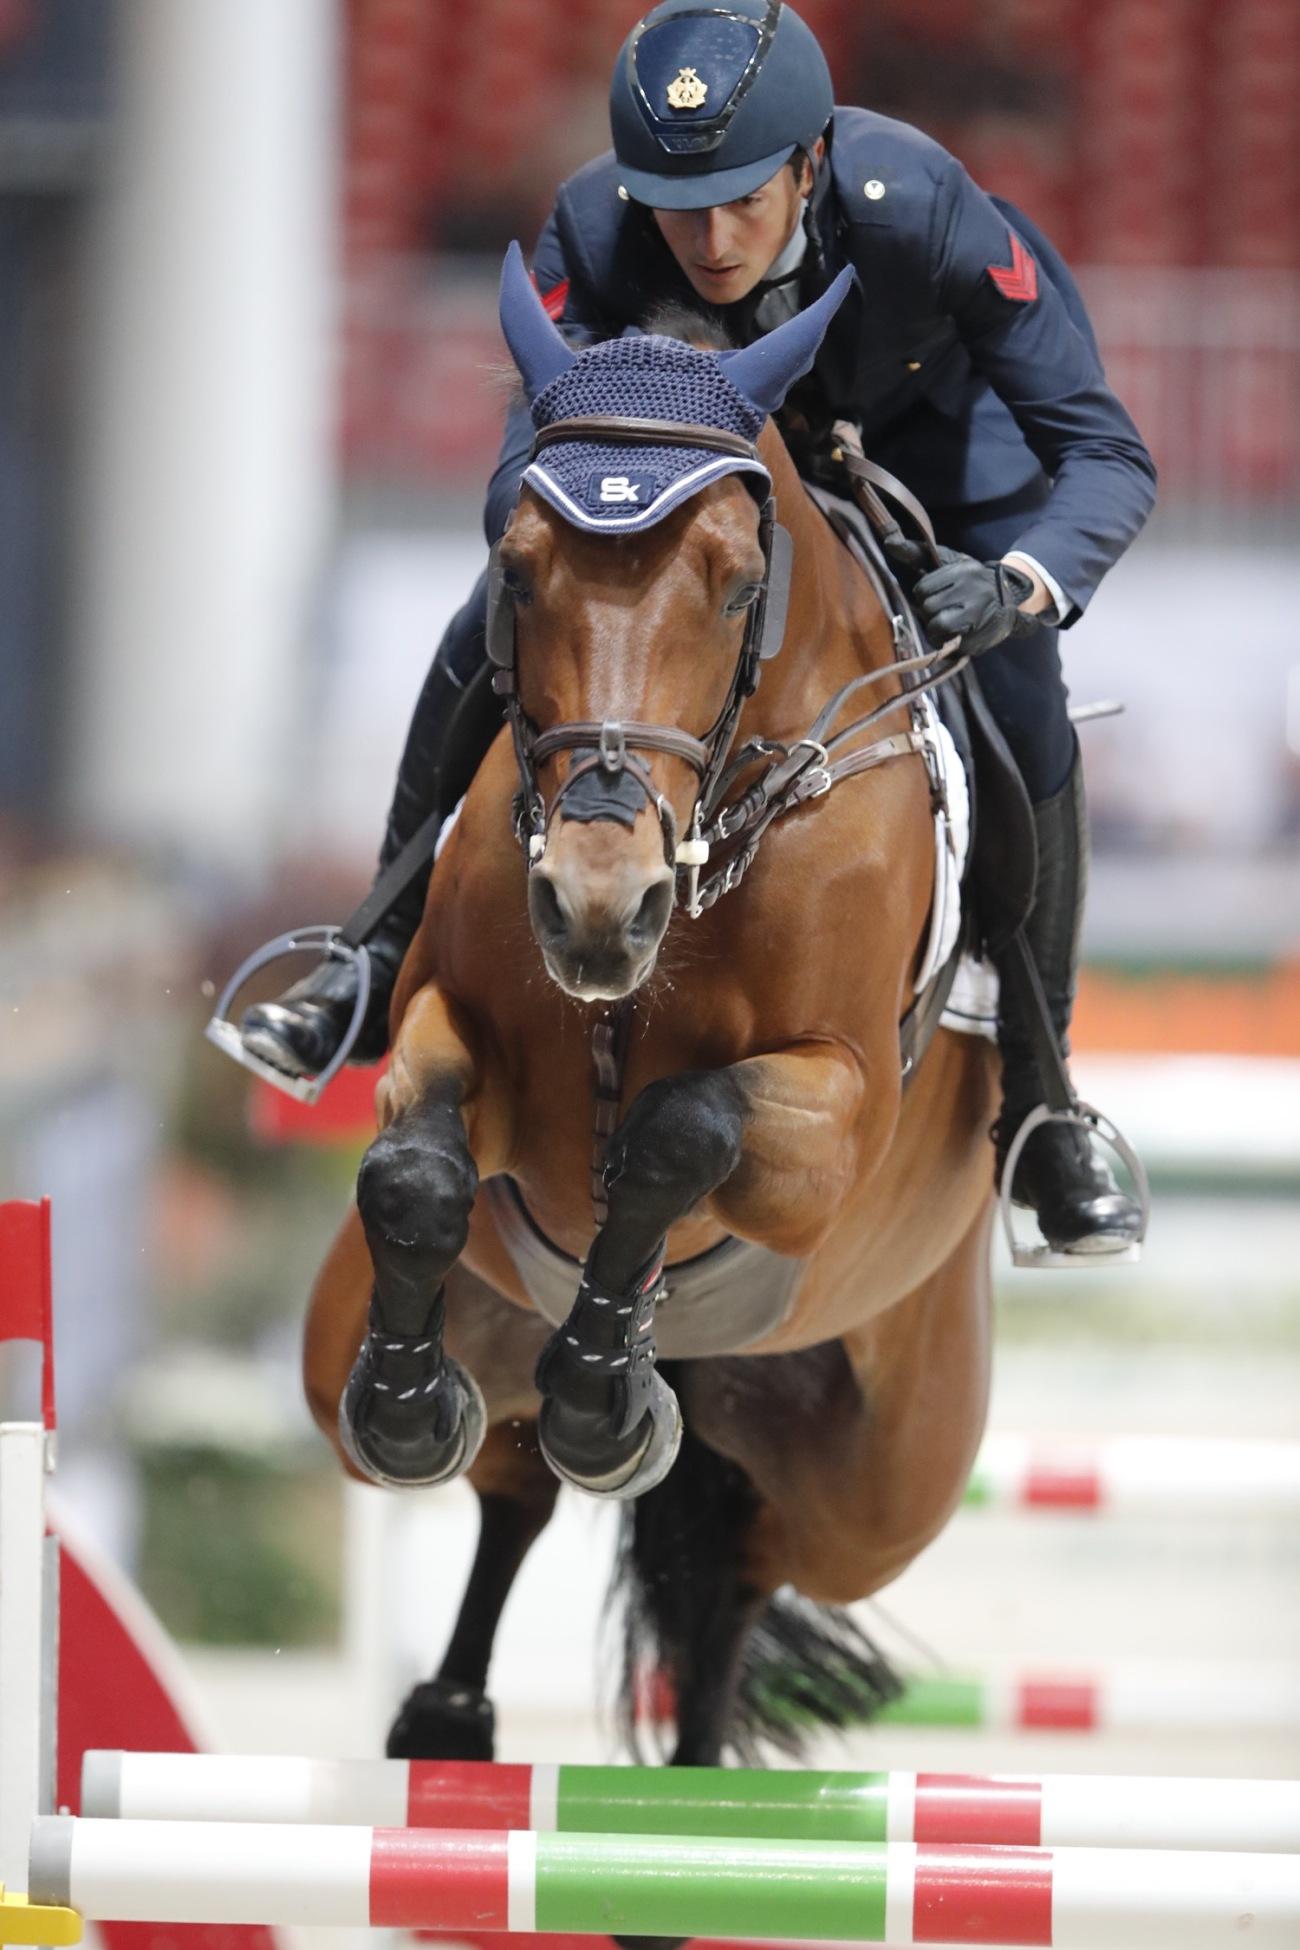 2018.10.28.99.99 Jumping Verona CSI 5 Safe Lorenzo de Luca & Evita van't Zaggehof JV SG 4.JPG